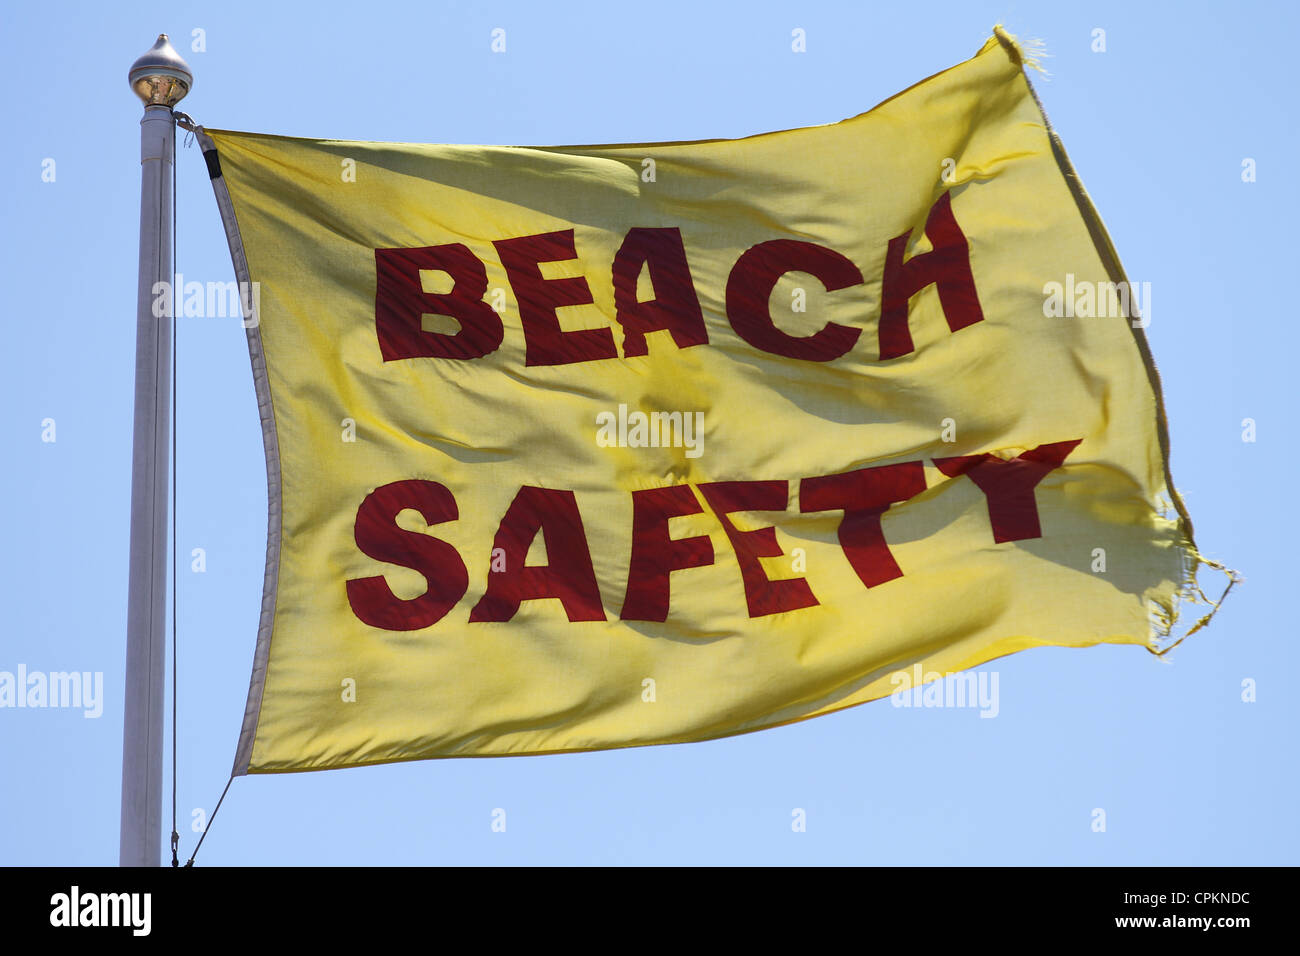 Safe British Beaches Beach Safety - Stock Image